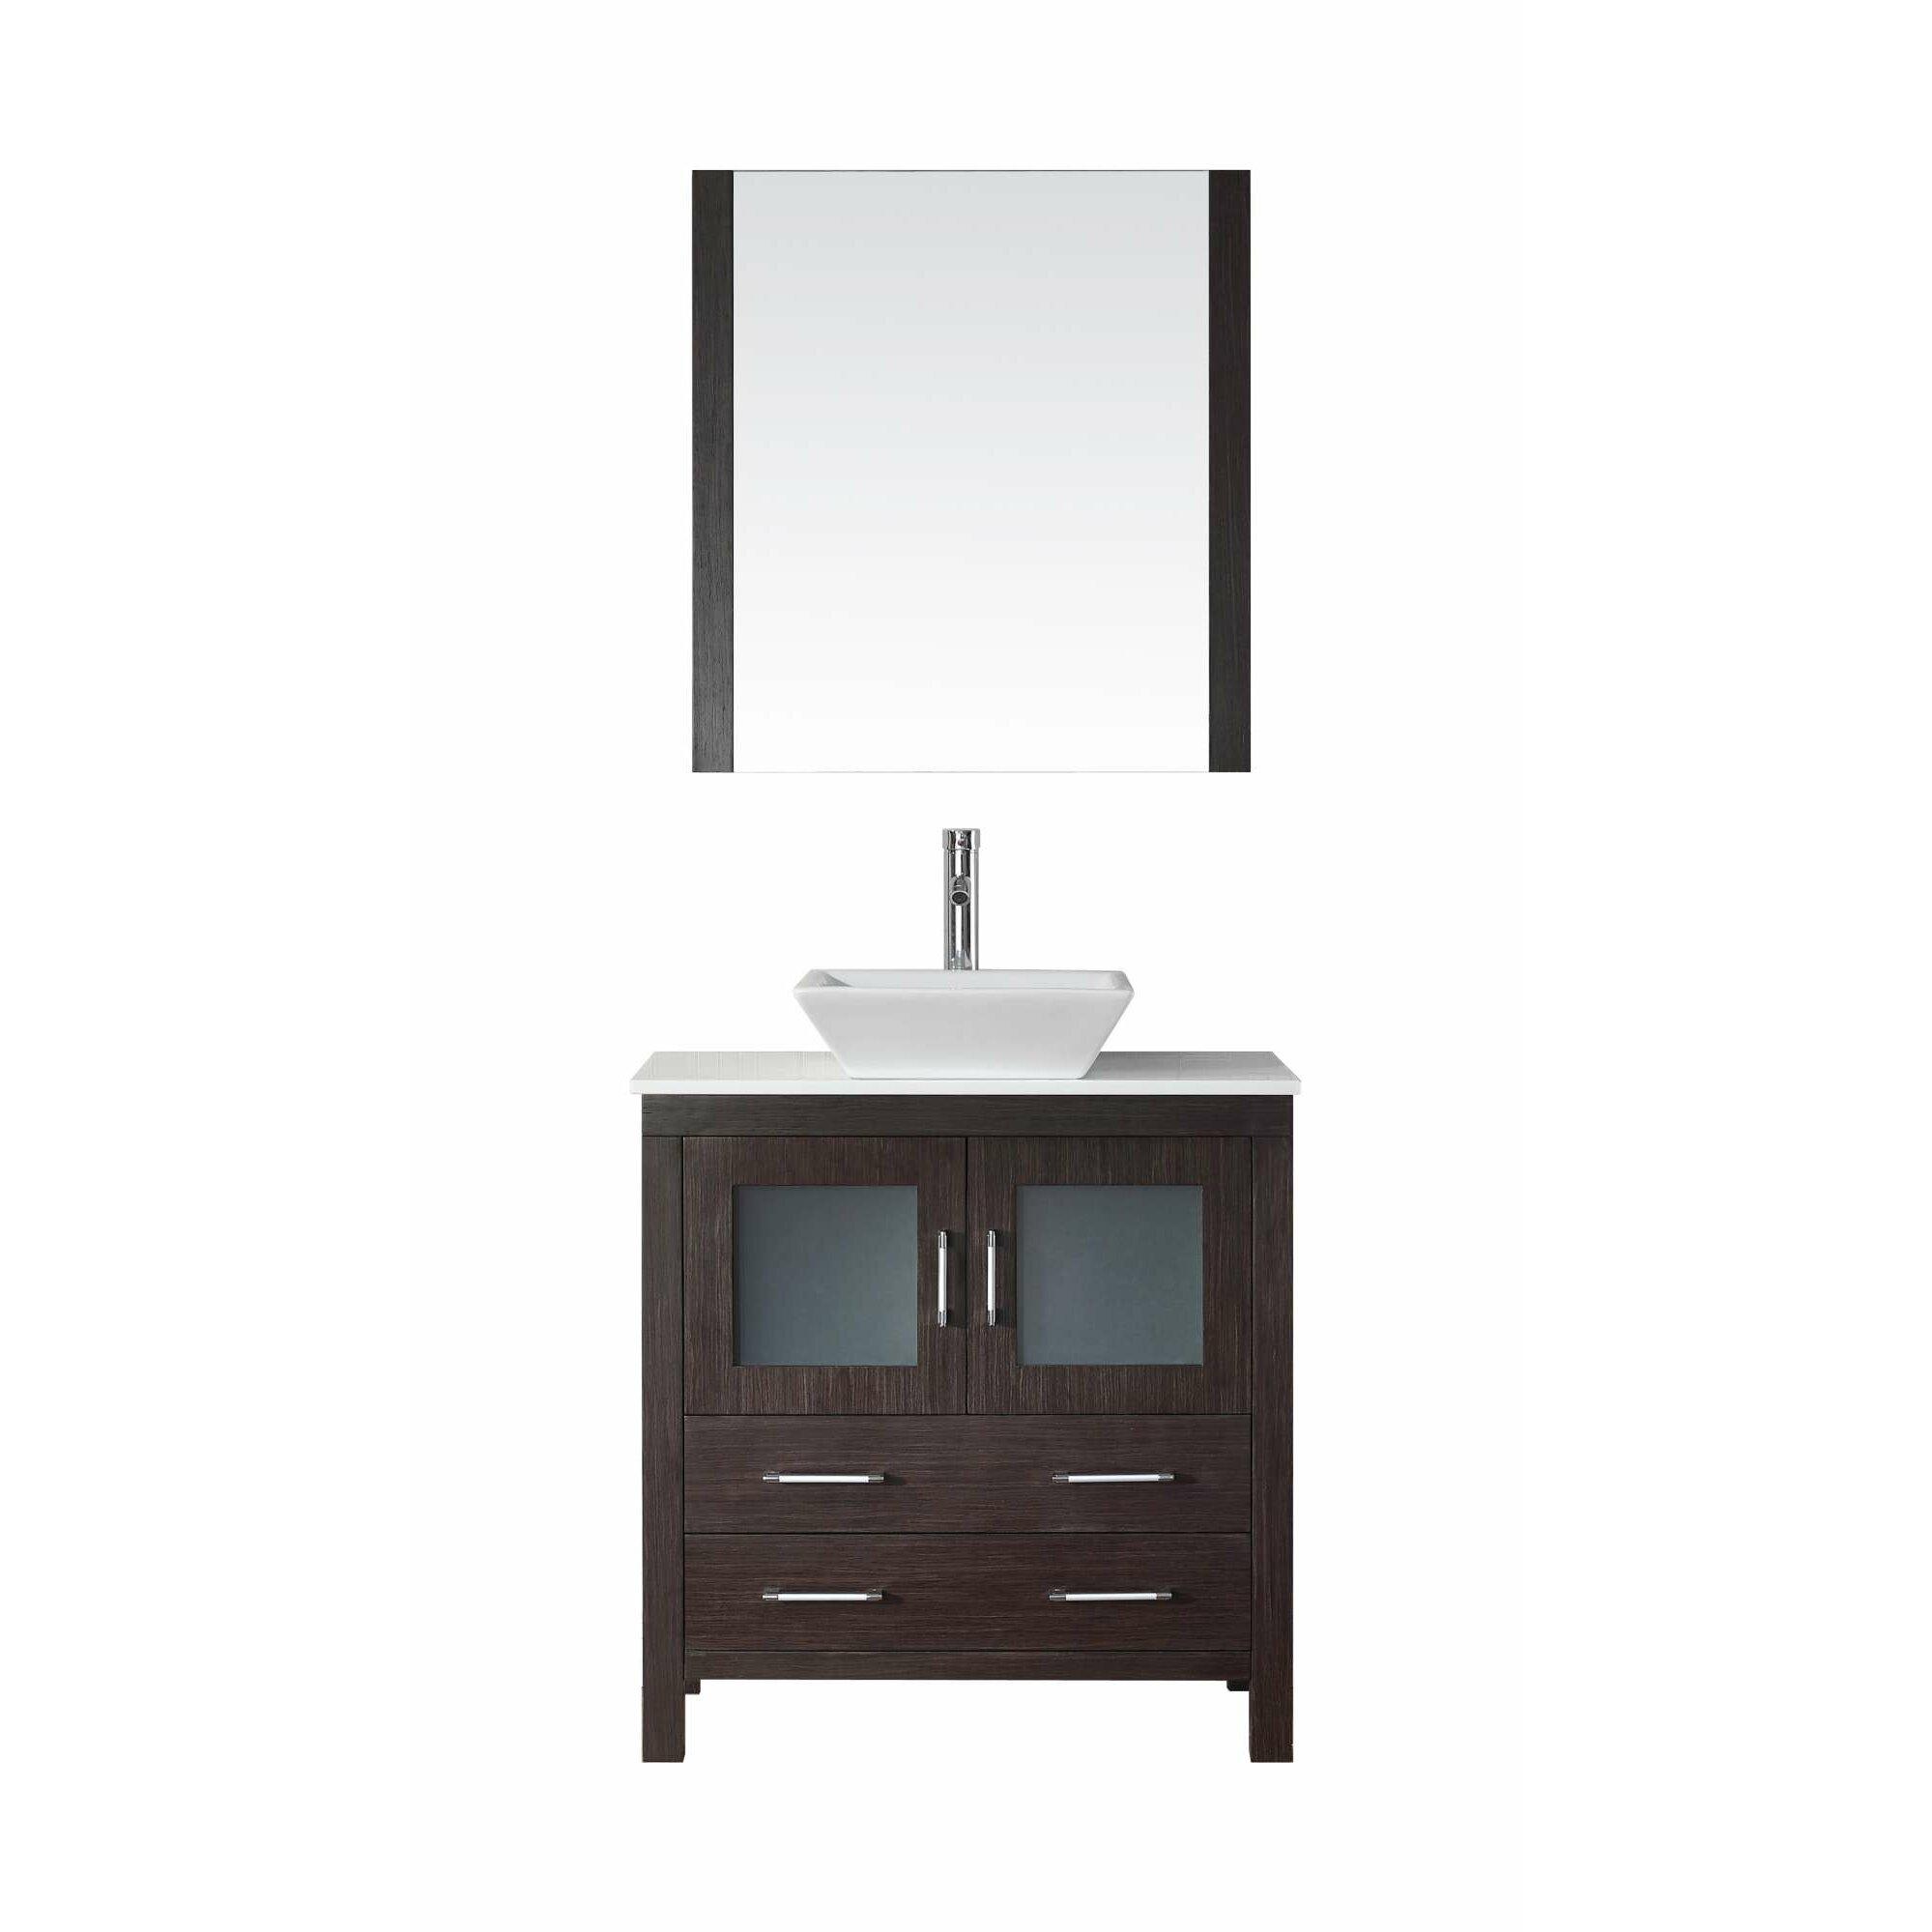 Virtu dior 32 single bathroom vanity set with mirror for Bathroom vanity sets